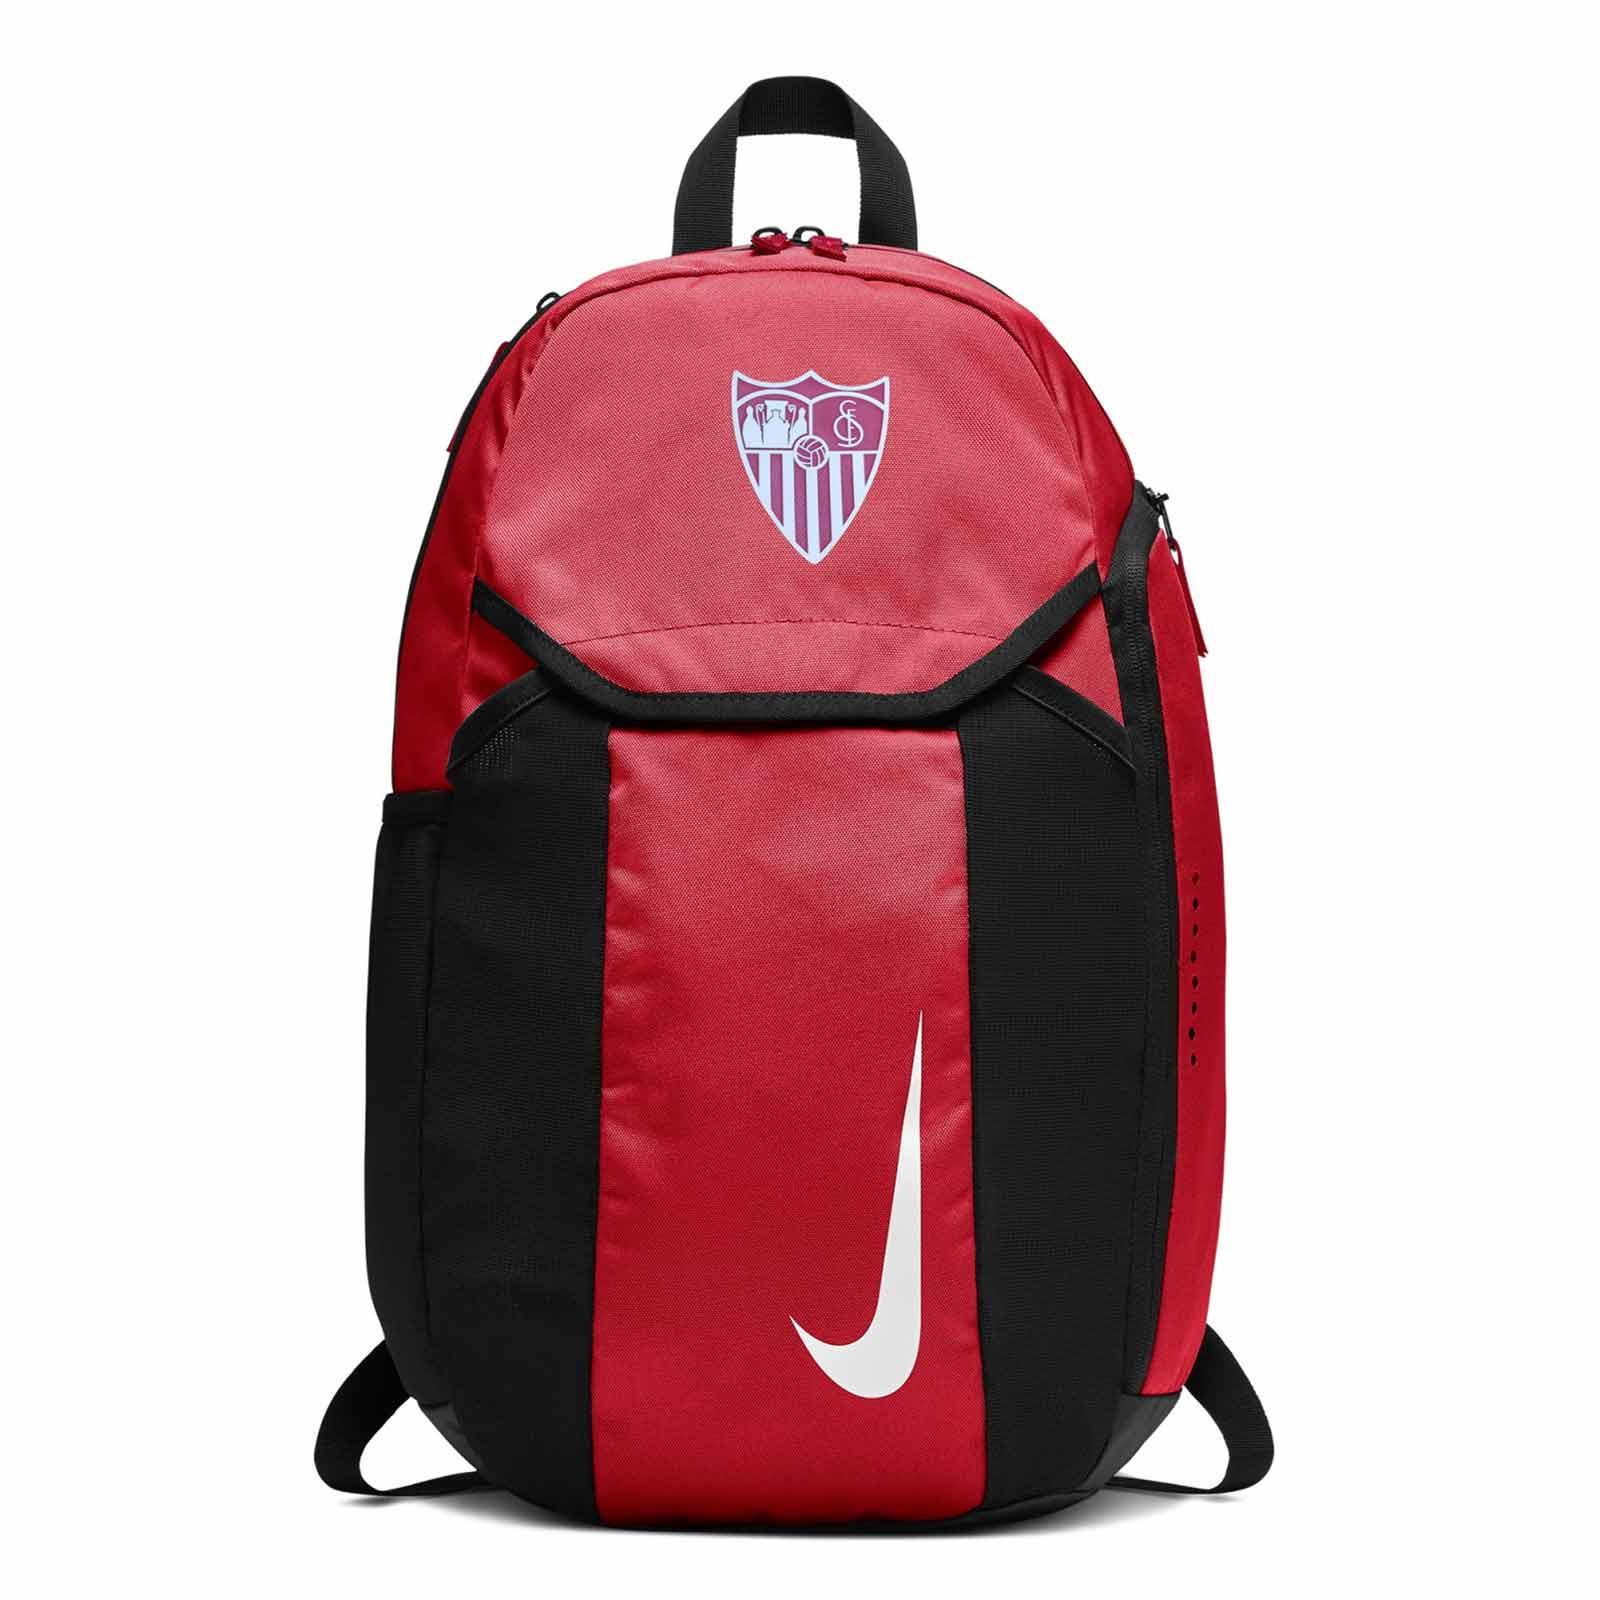 Trascender Floración vacío  Mochila Nike Sevilla 18 - 19 roja | futbolmania